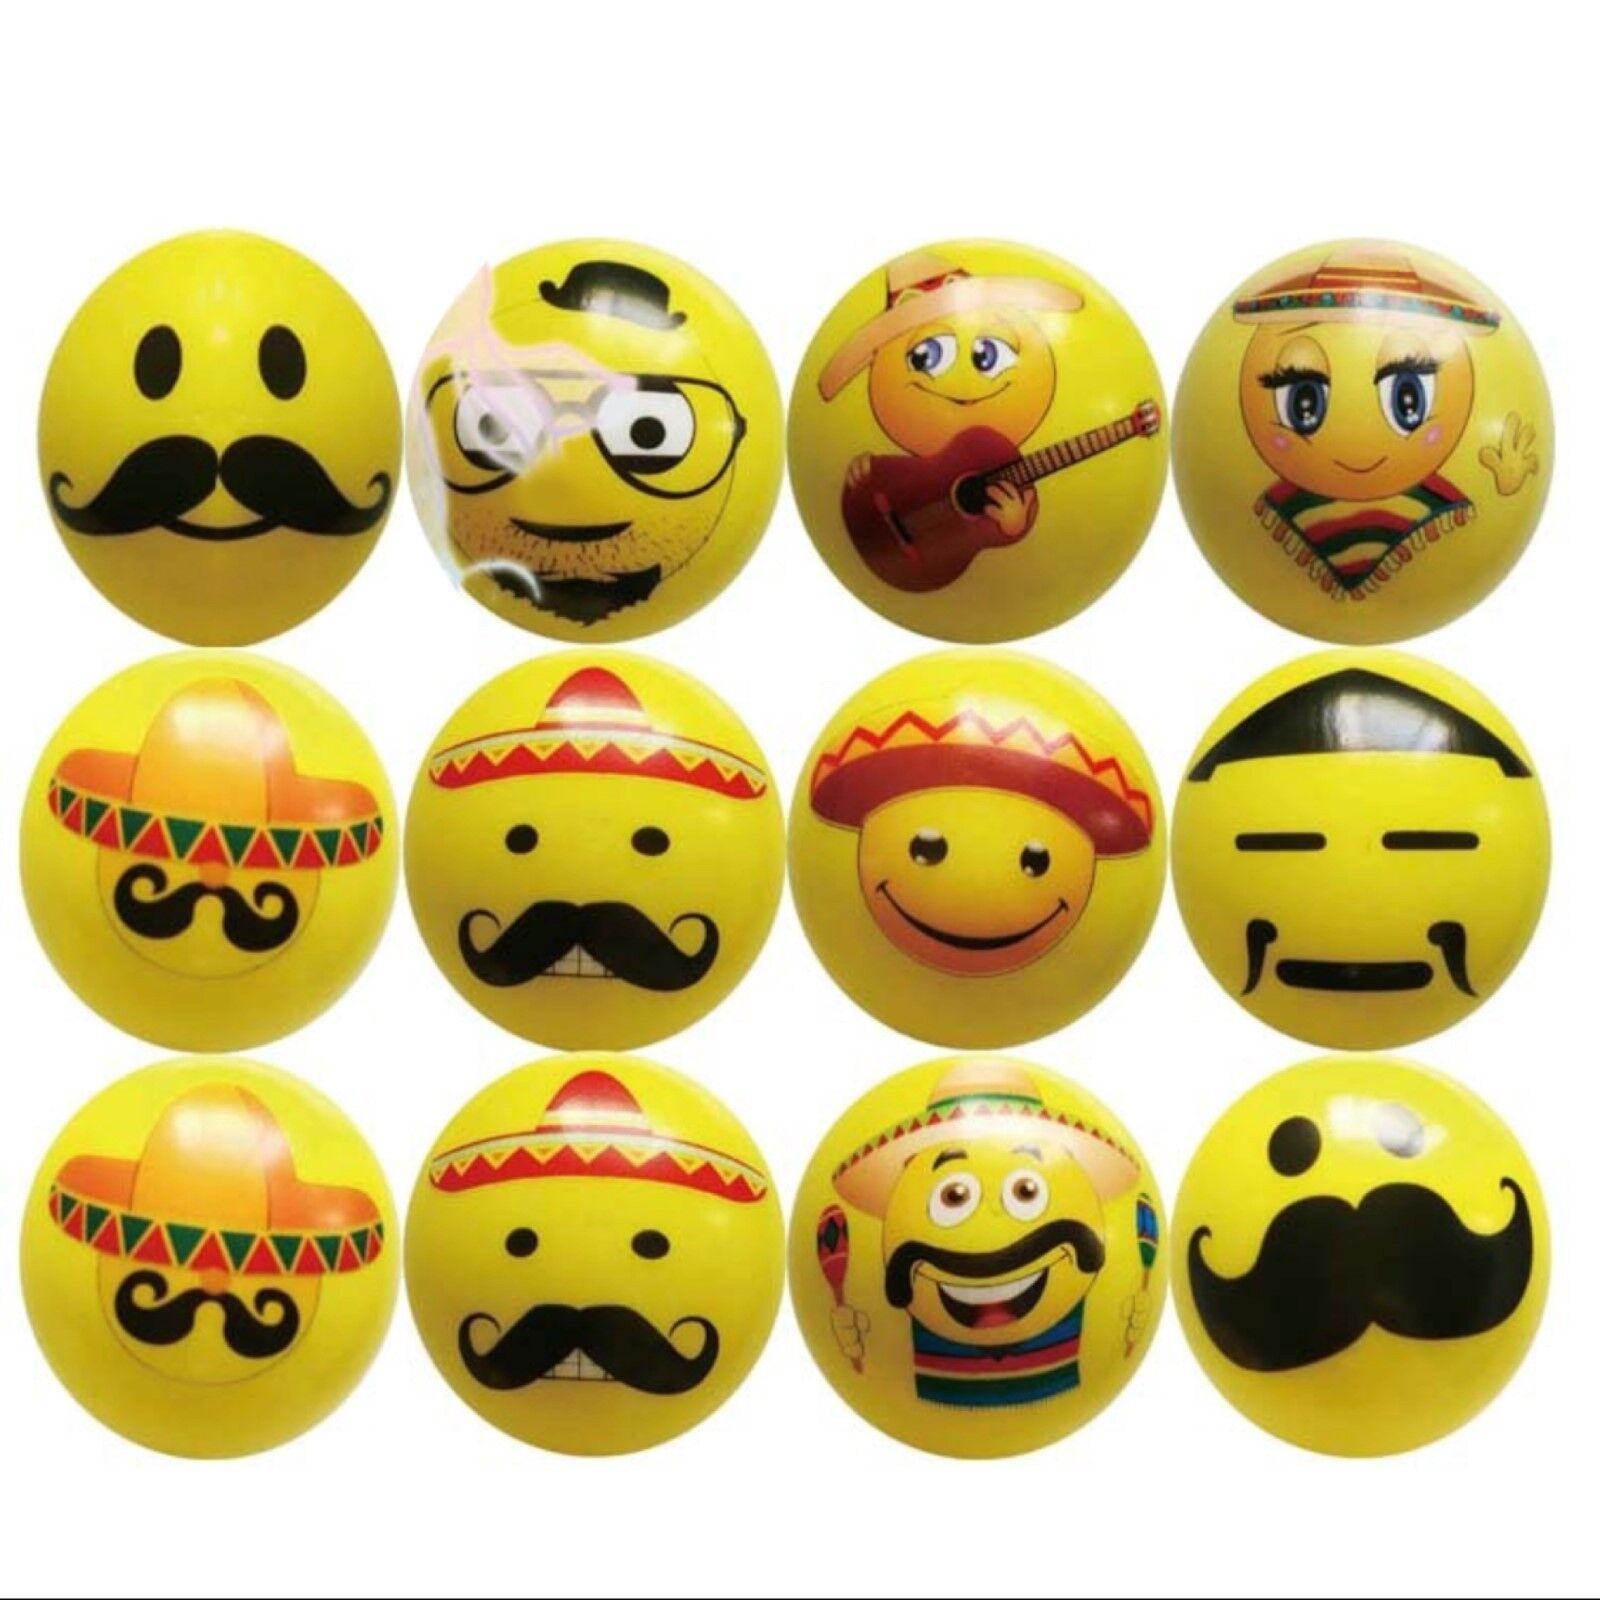 Pack of 12 Fun Party Prizes Emoticon Key Chains Playo Light Up Emoji Keychain Balls